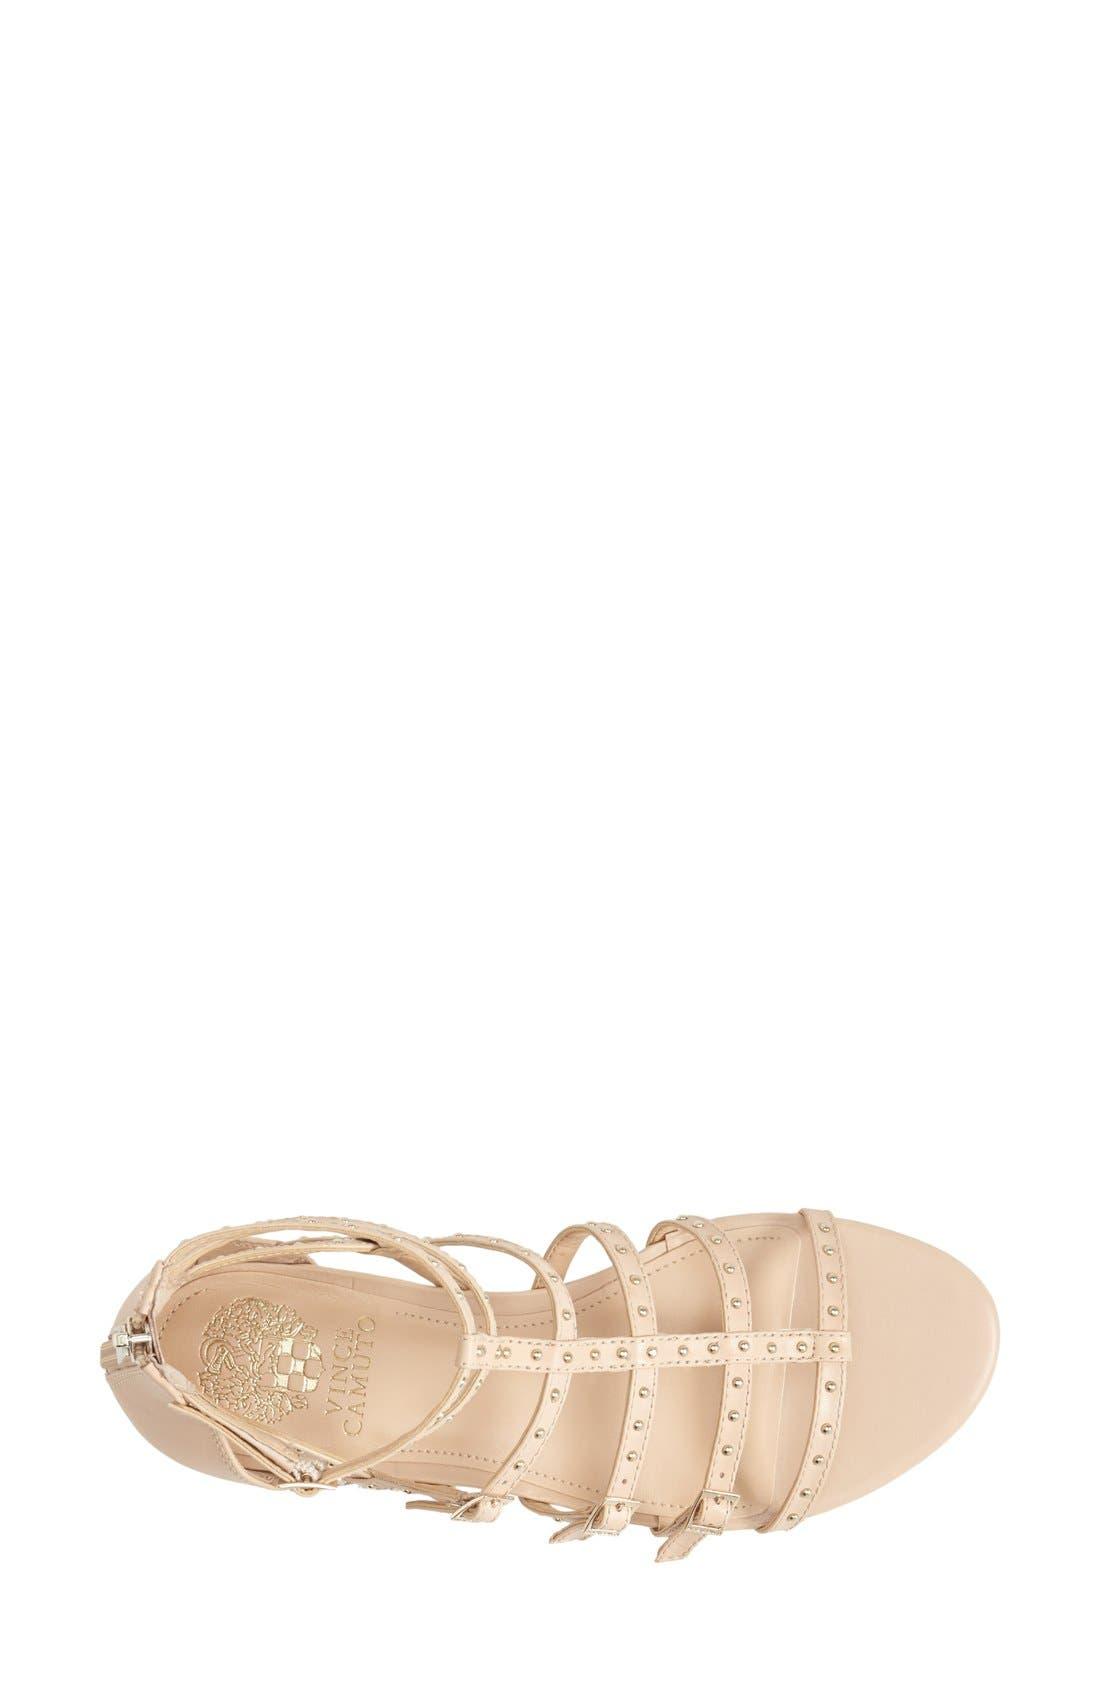 Alternate Image 3  - Vince Camuto 'Hevelli' Studded Leather Gladiator Sandal (Women)